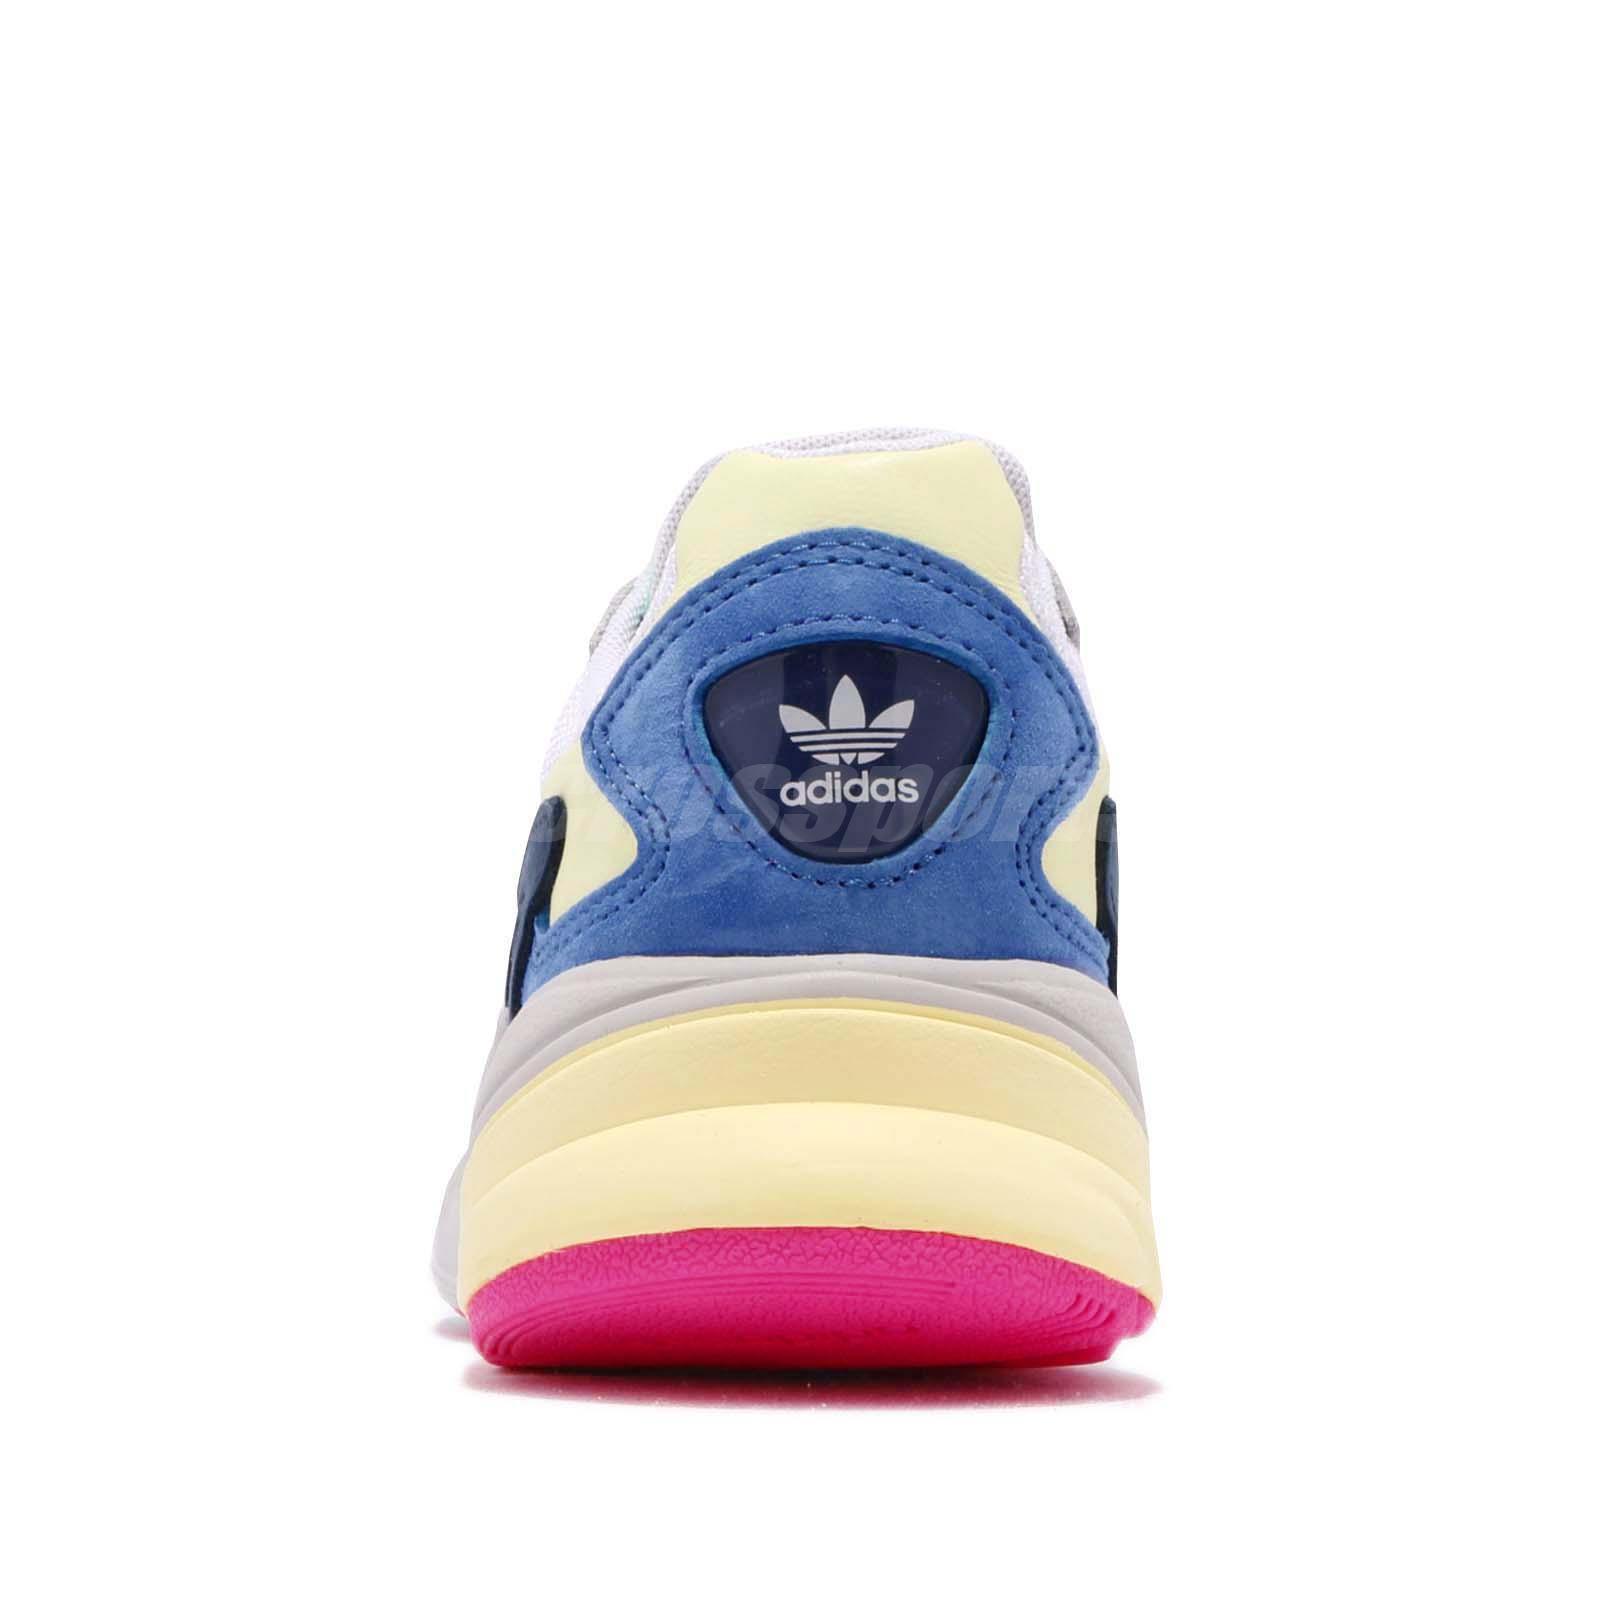 7d5cf34e15af adidas Originals Falcon W White Blue Green Yellow Women Lifestyle ...